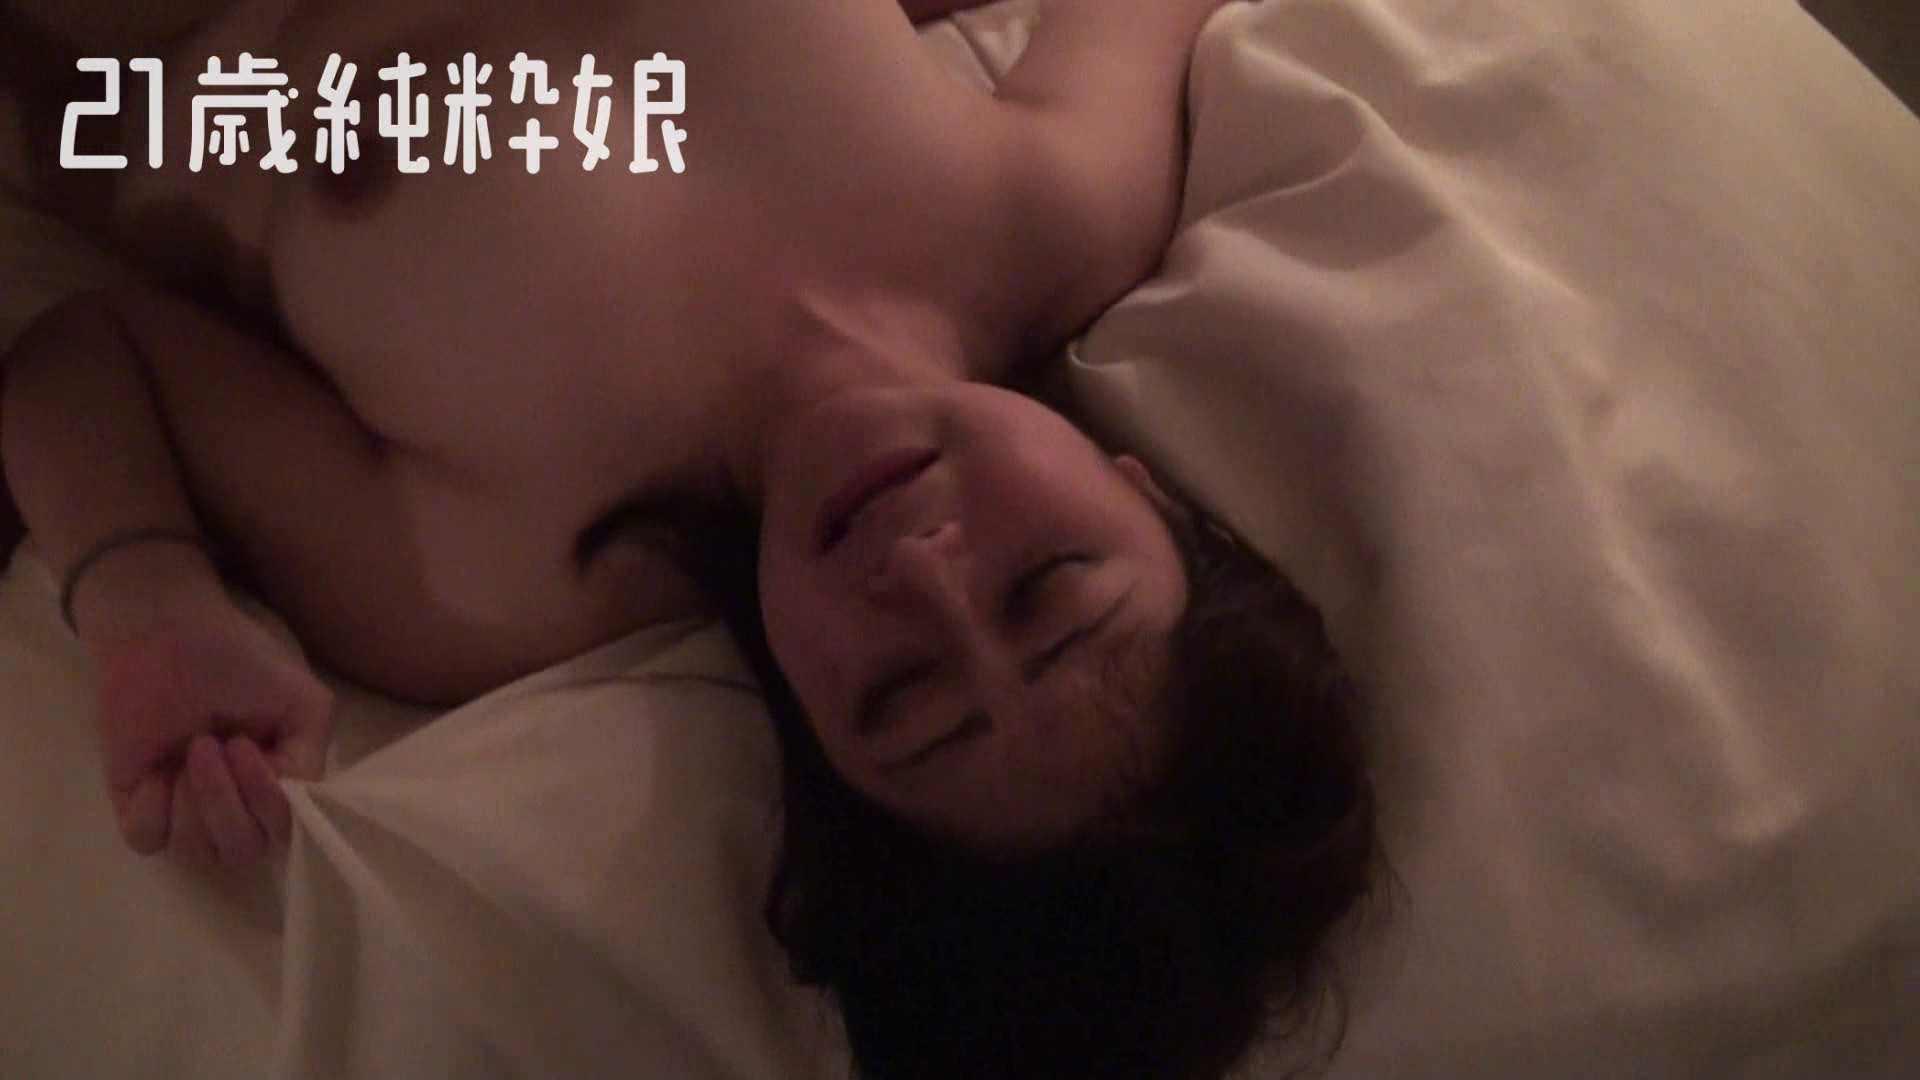 Gカップ21歳純粋嬢第2弾Vol.4 OLの裸事情 | 学校  69枚 61